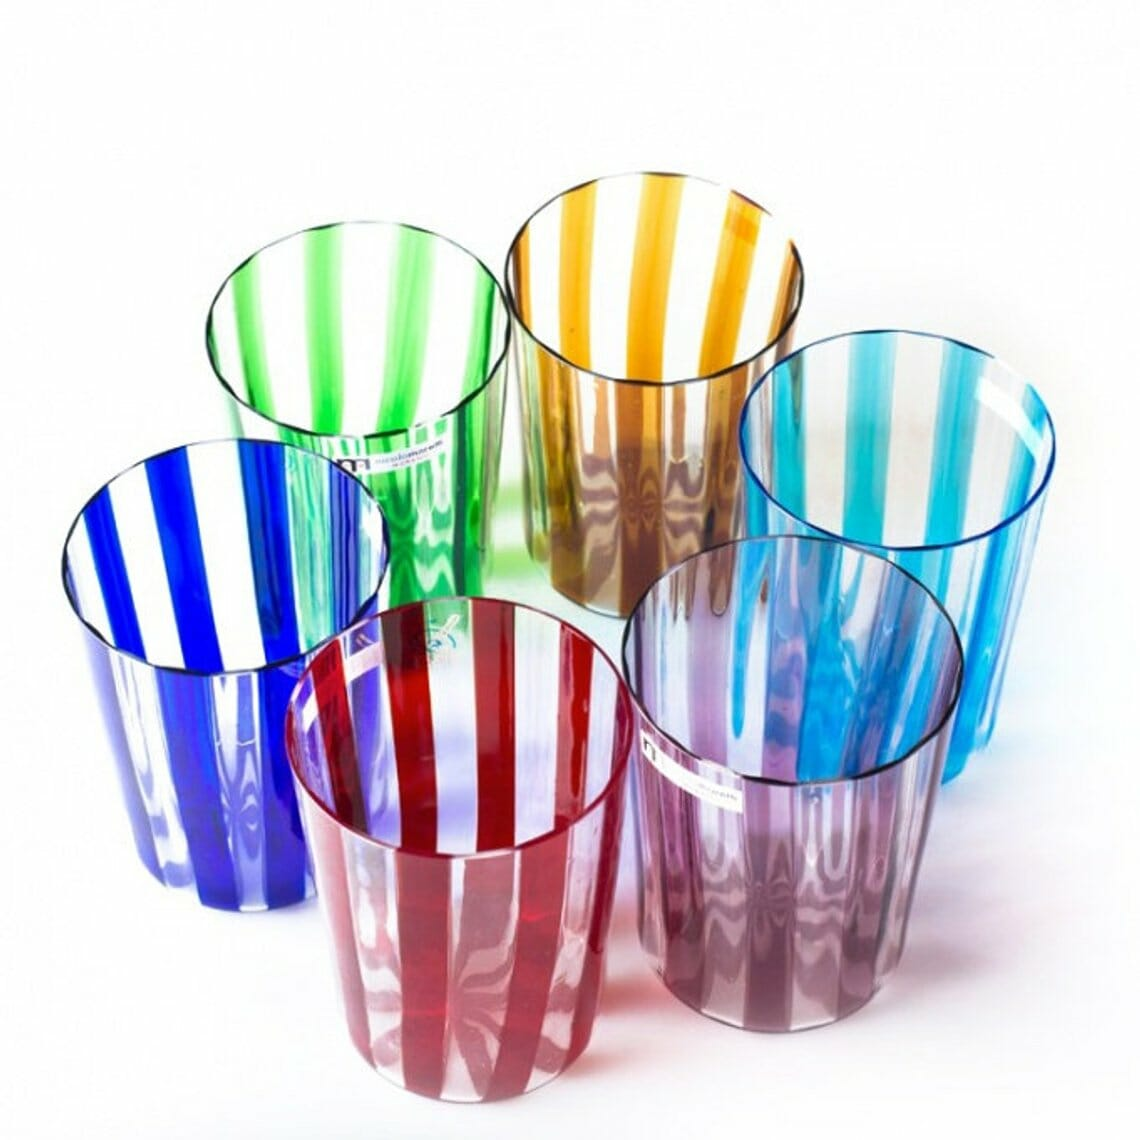 striped-glasses.jpg